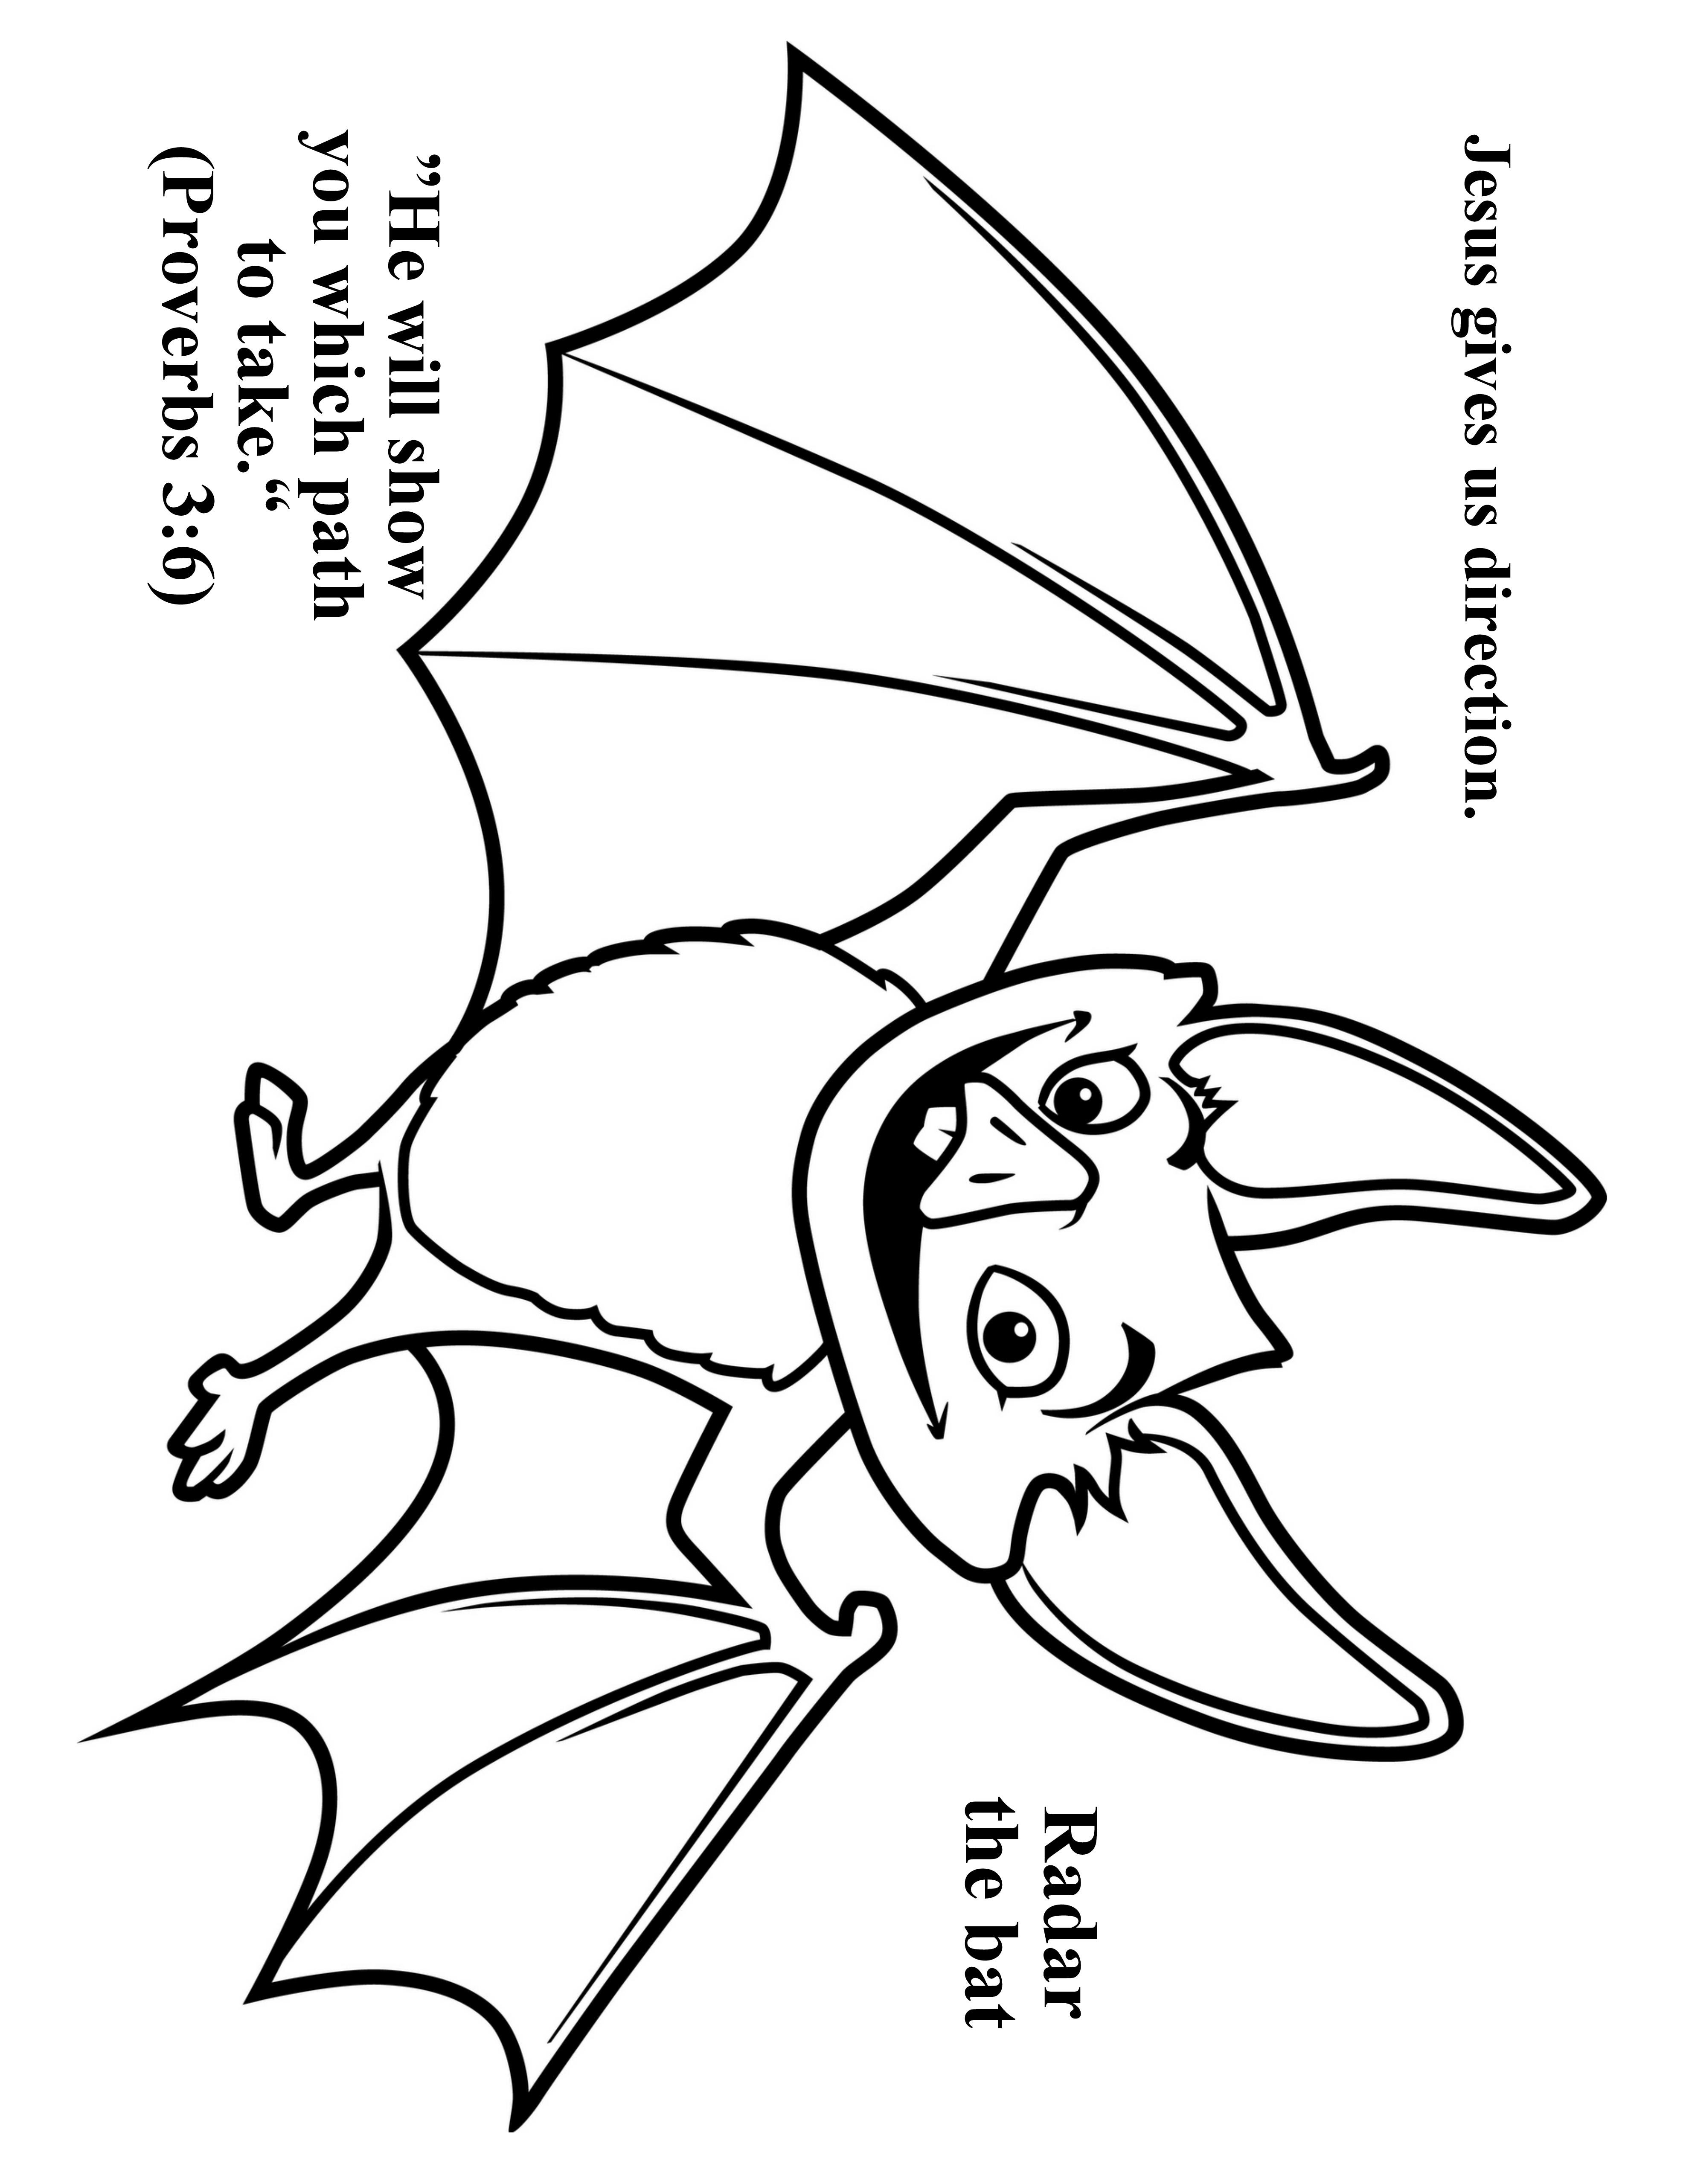 3952x5120 Cave Quest Day 3 Preschool Coloring Page Radar The Bat. Cave